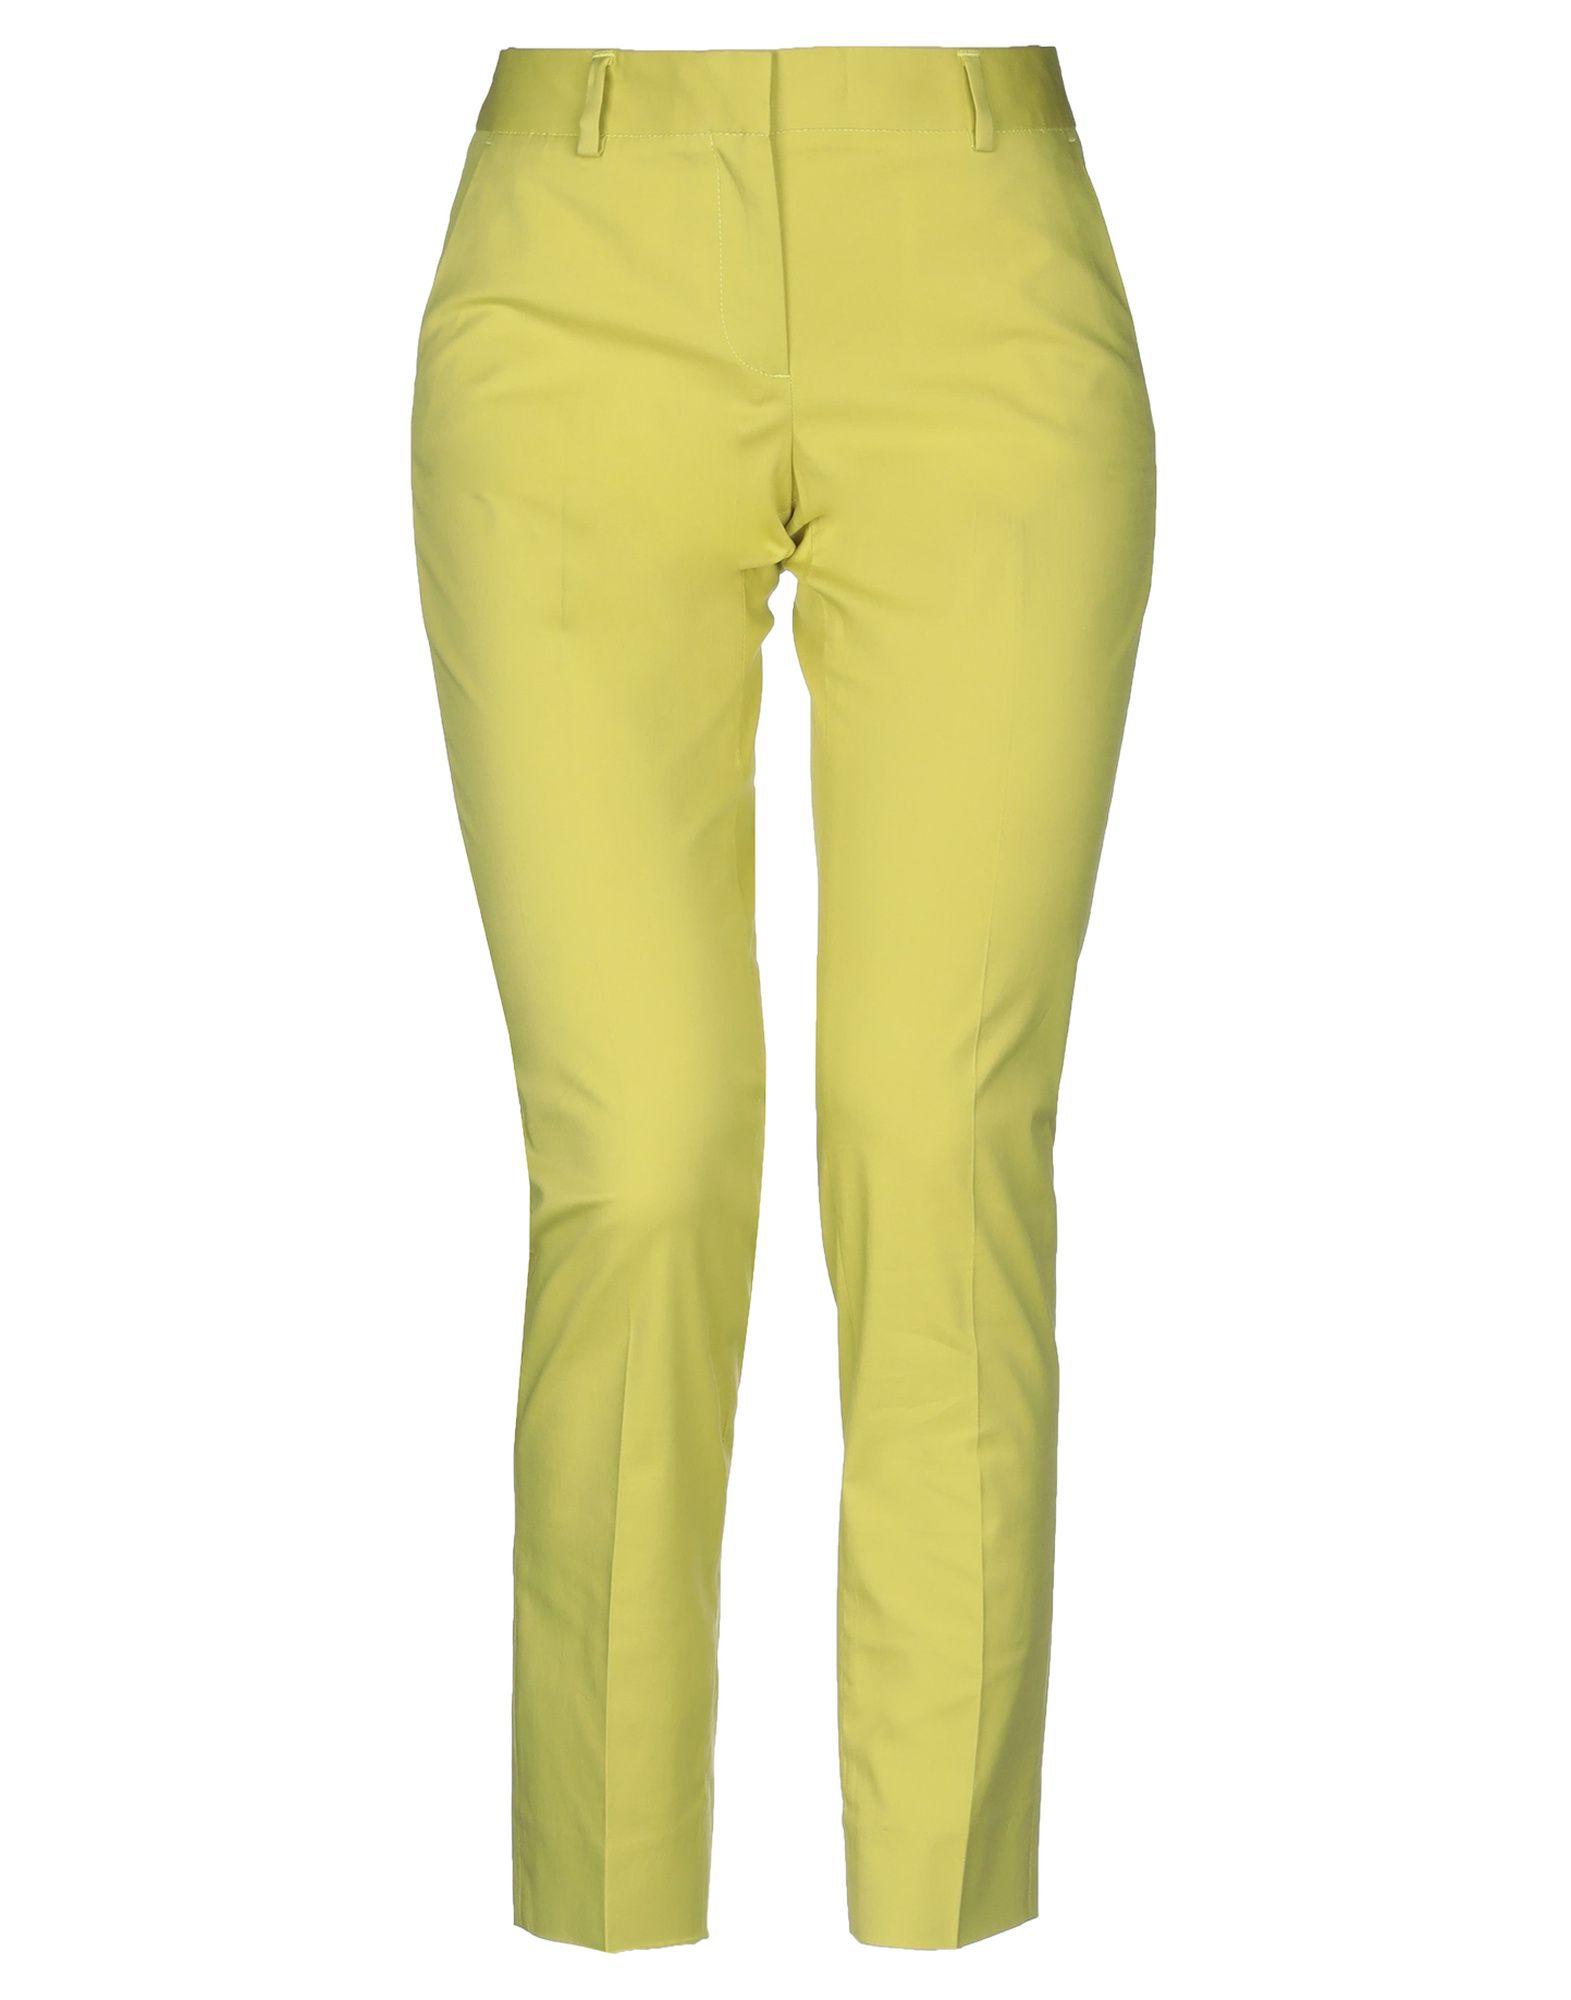 MAURO GRIFONI Повседневные брюки dolcevita повседневные брюки